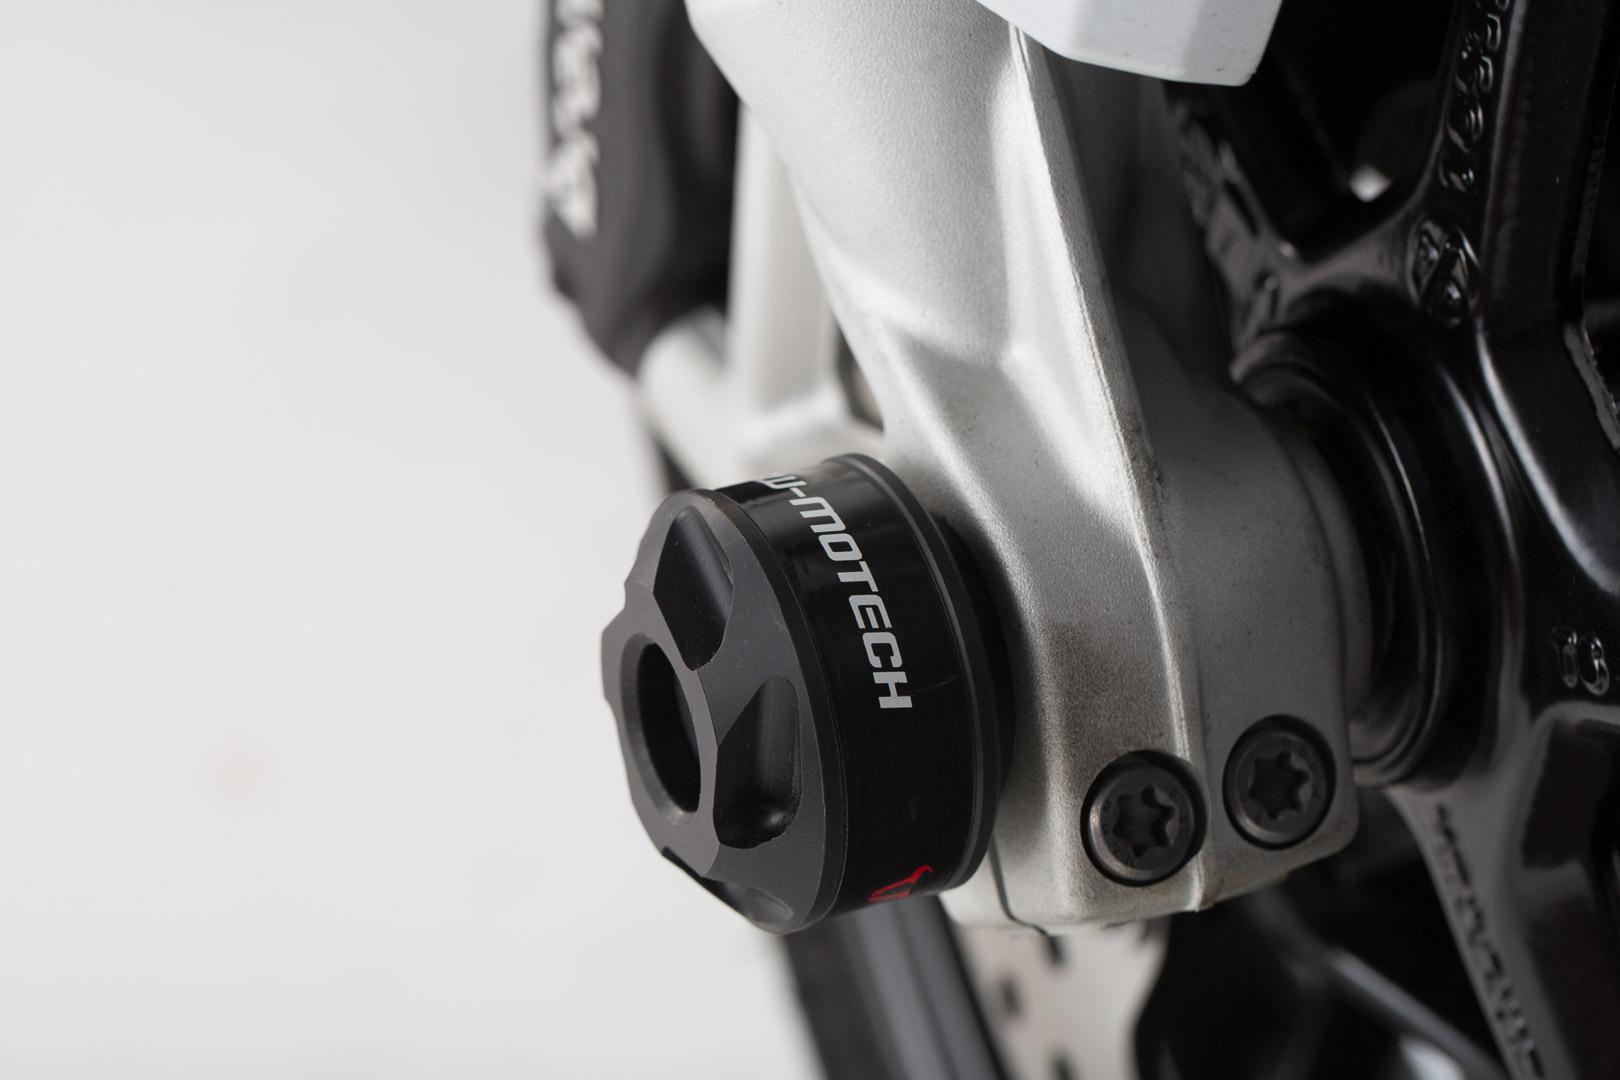 Slider set for front axle BMW F800R / R1200 / R1250 / RnineT / S1000XR